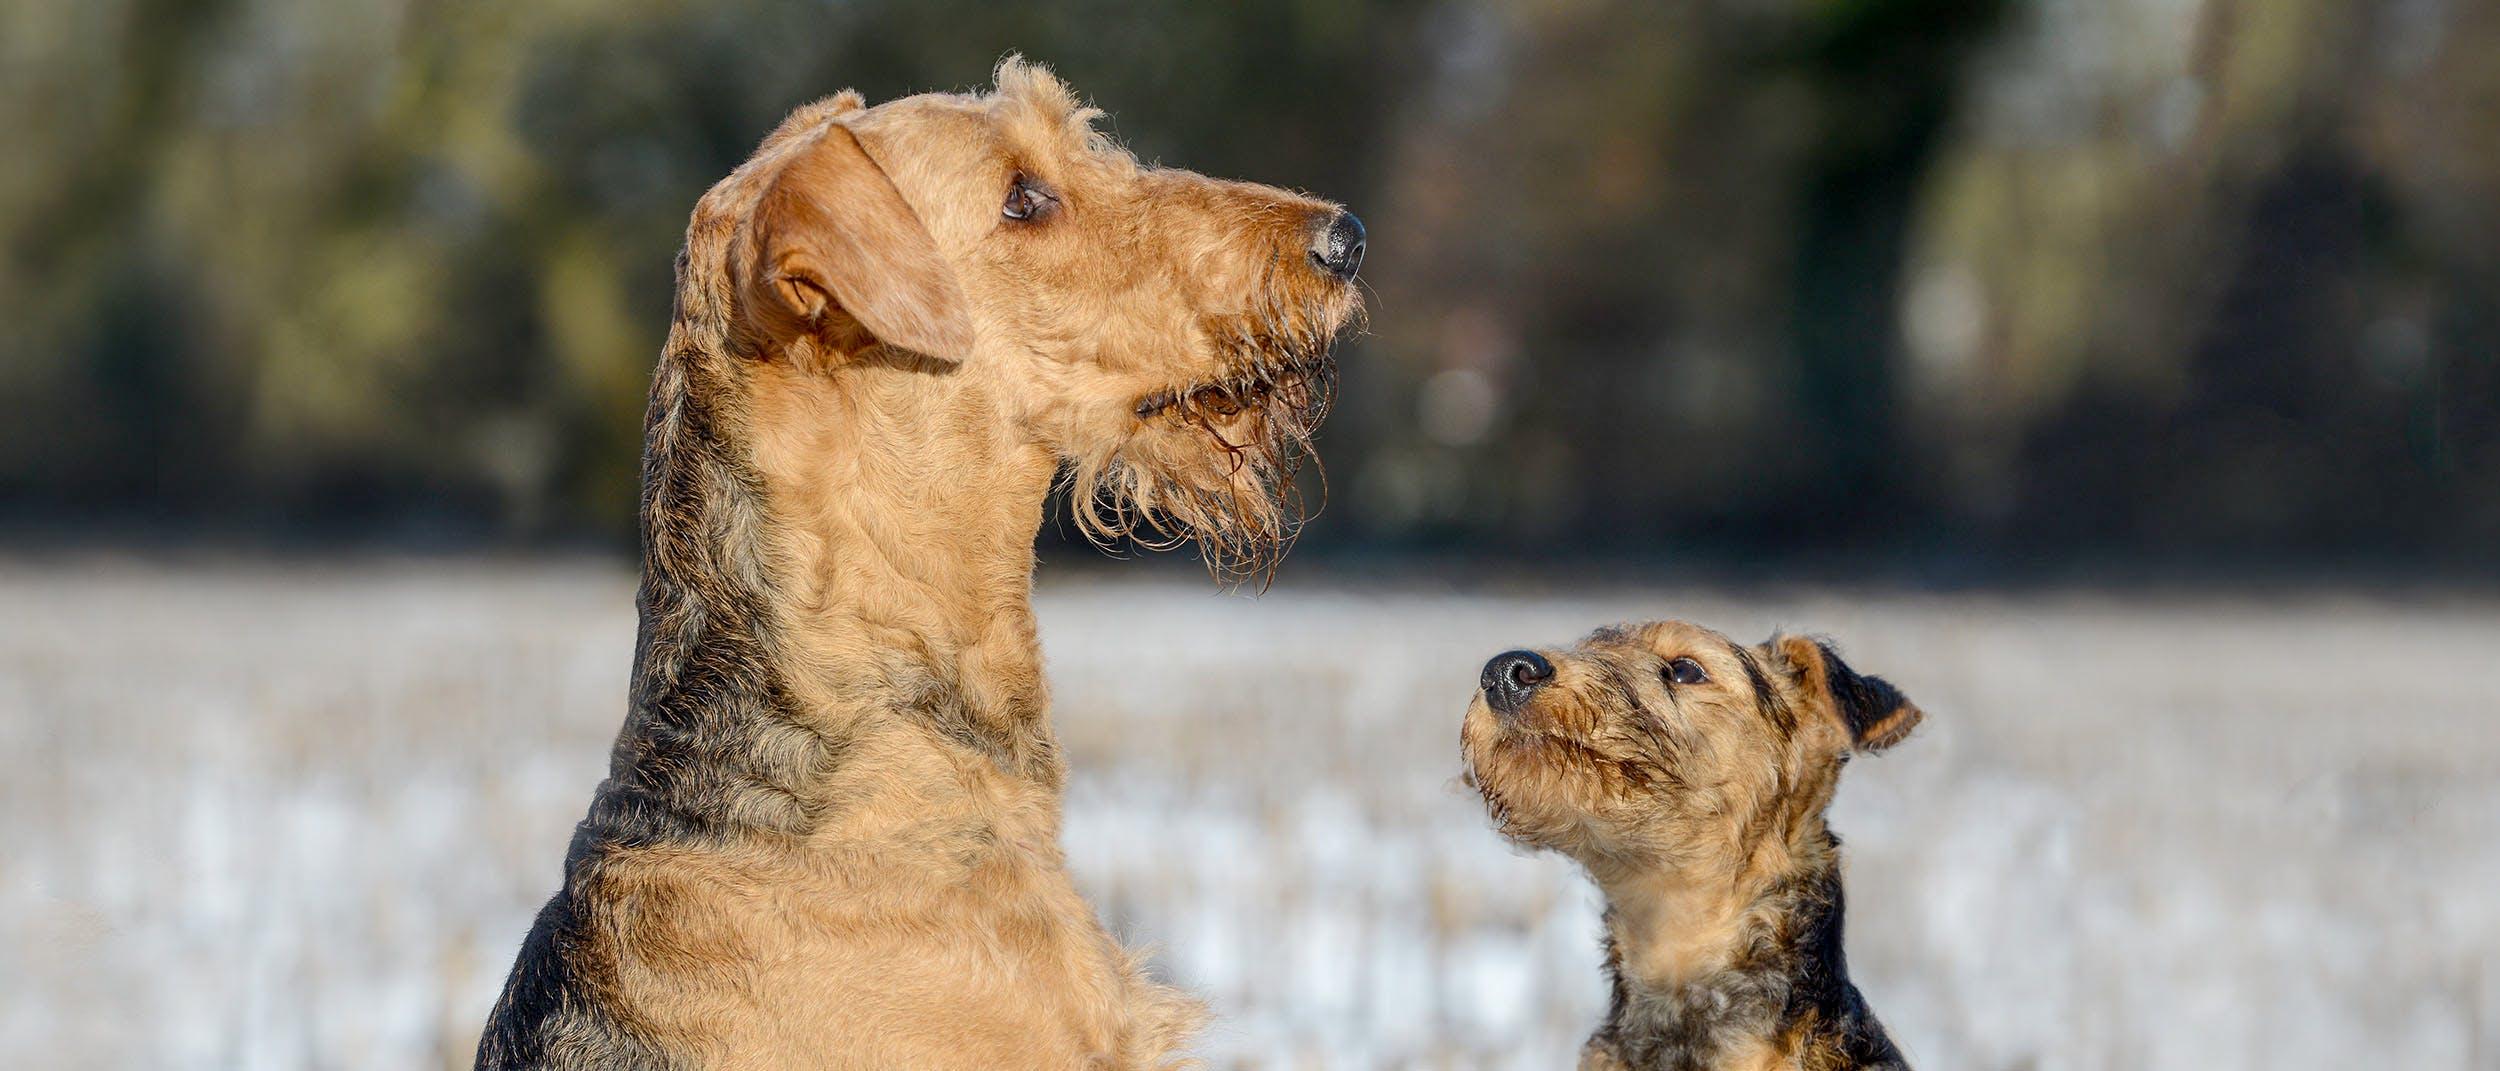 Dovrei adottare un cane o comprare un cucciolo?